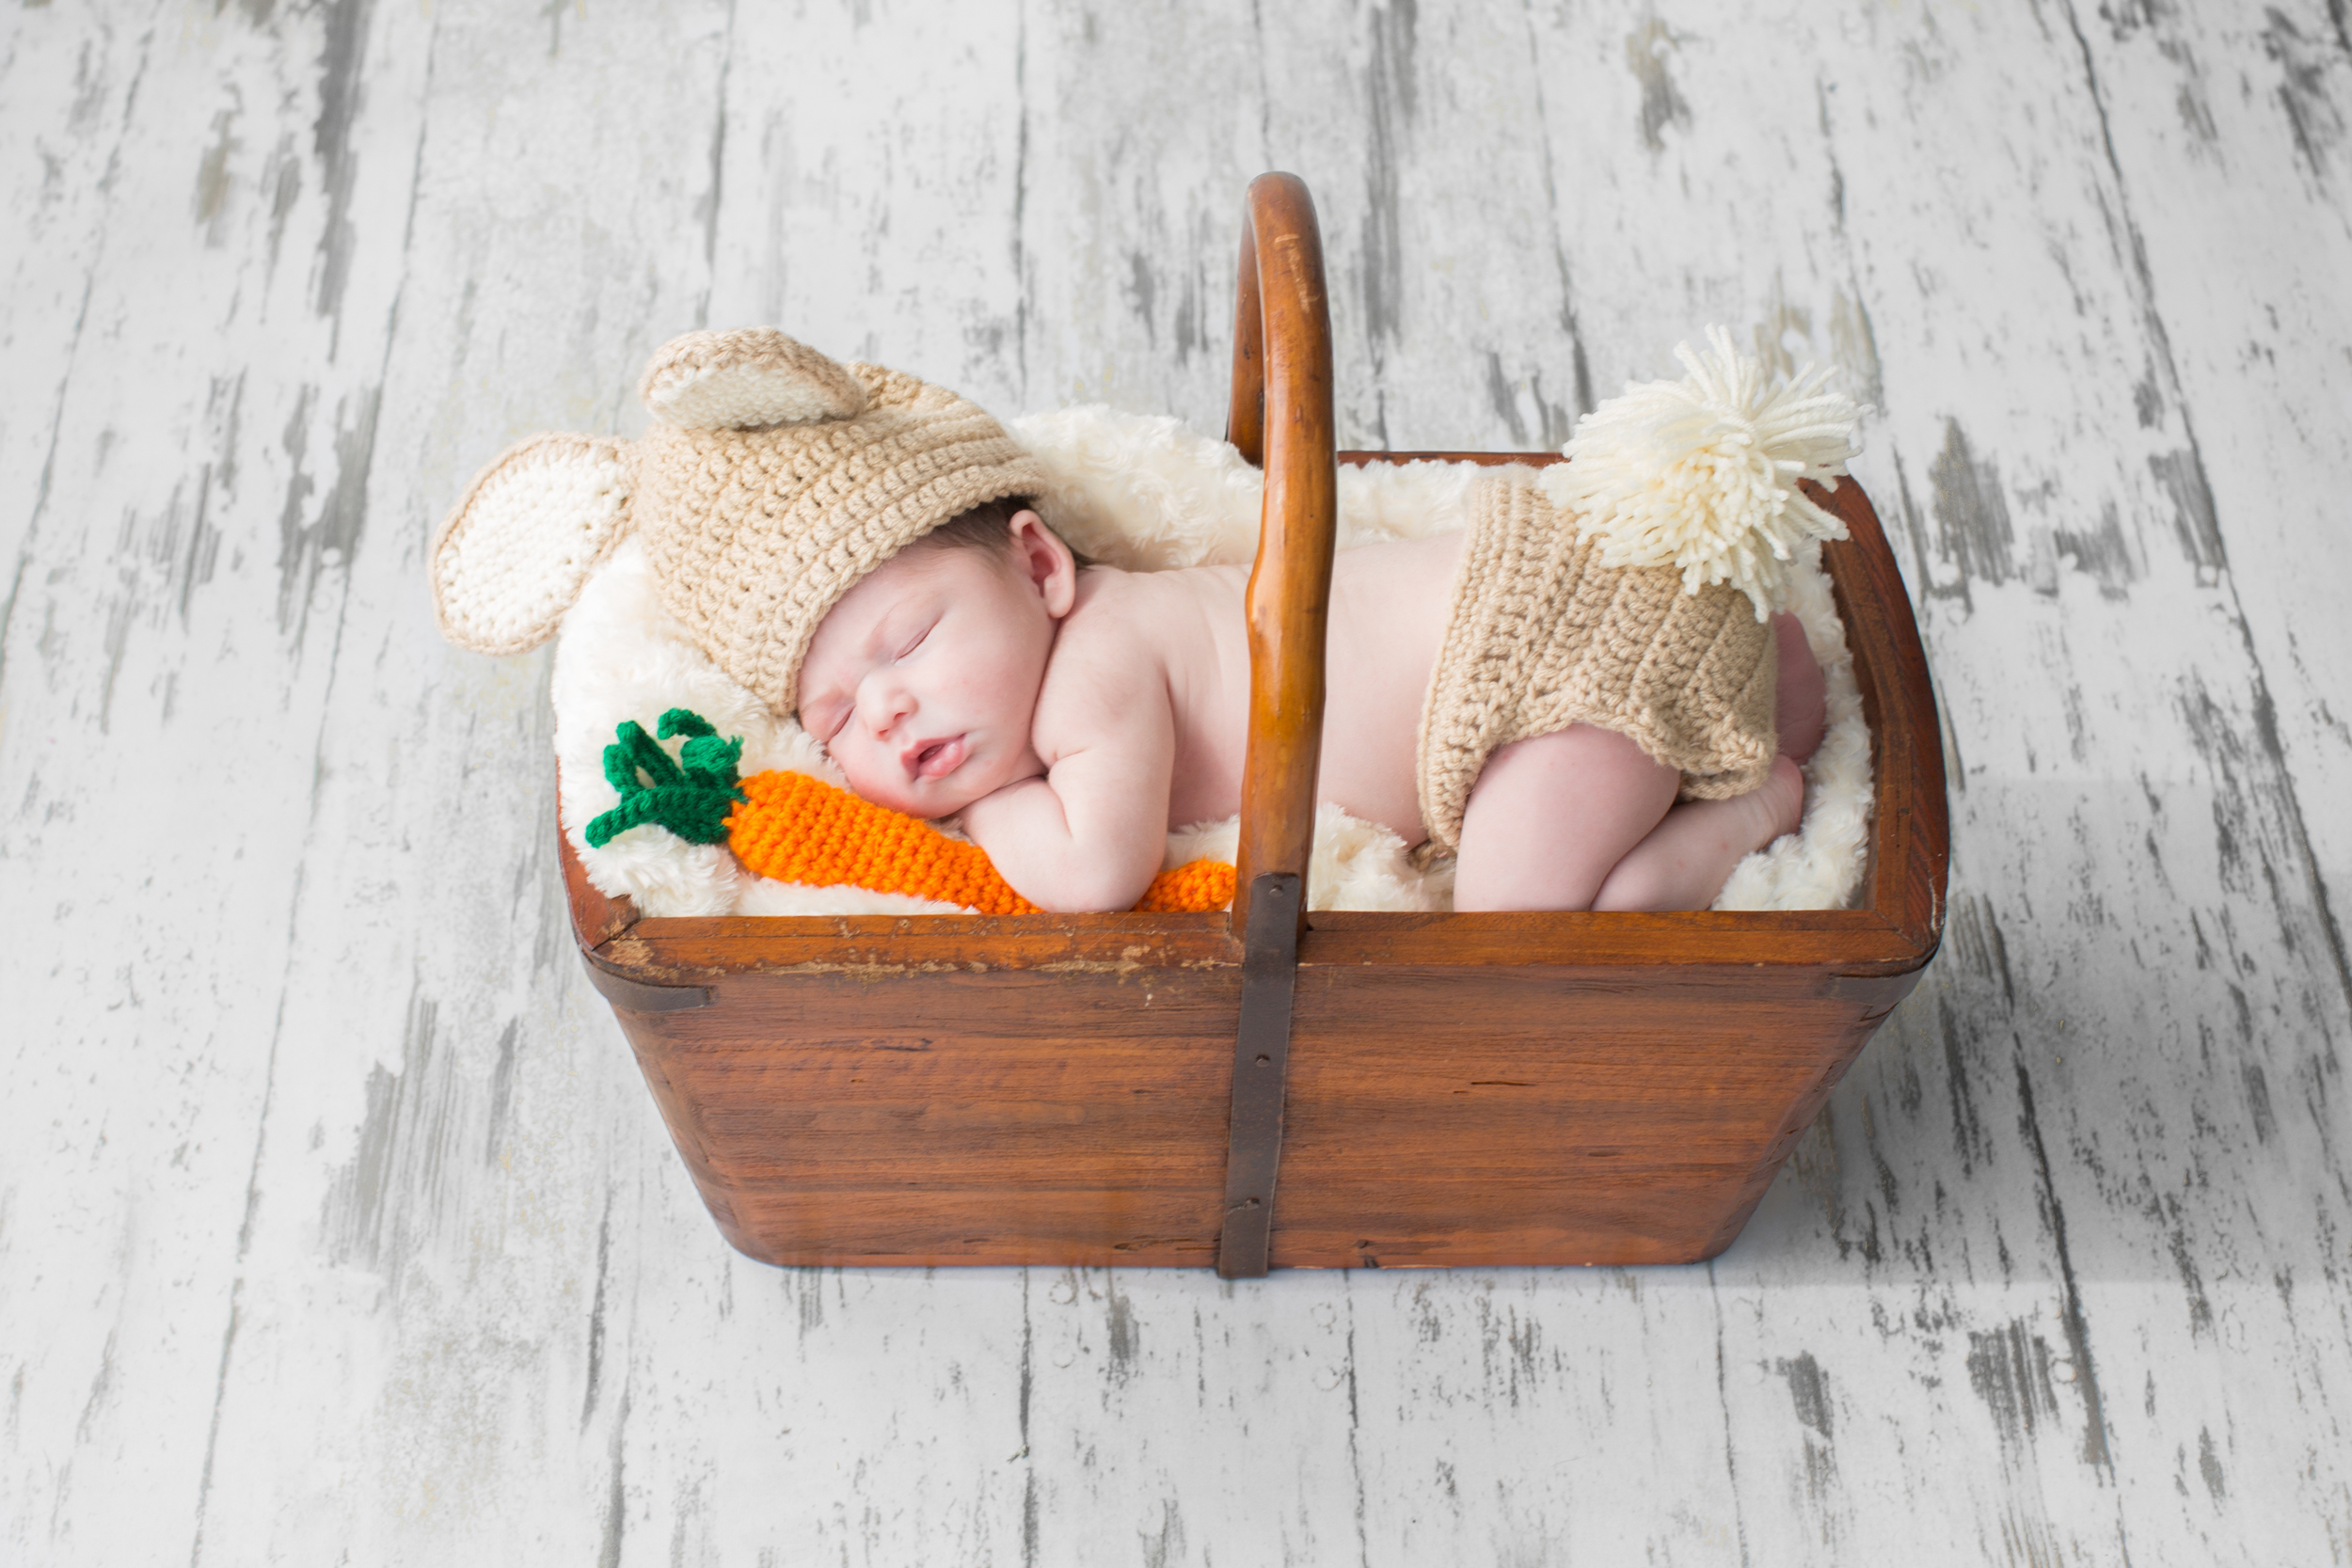 newborn in a basket.jpg